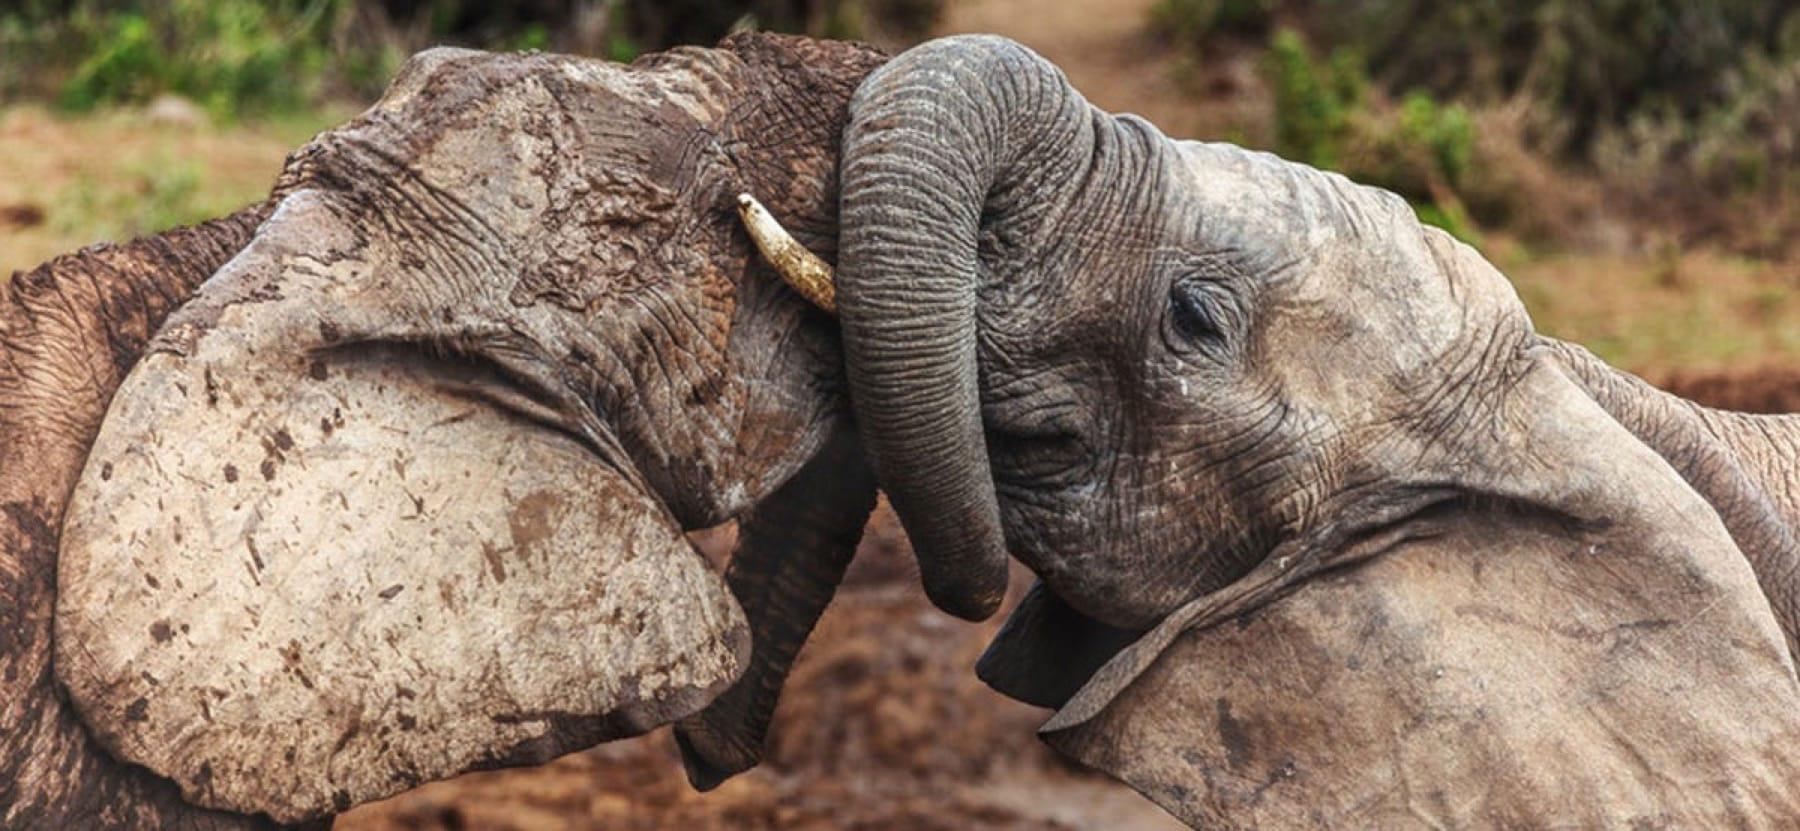 The Addo Elephant Park